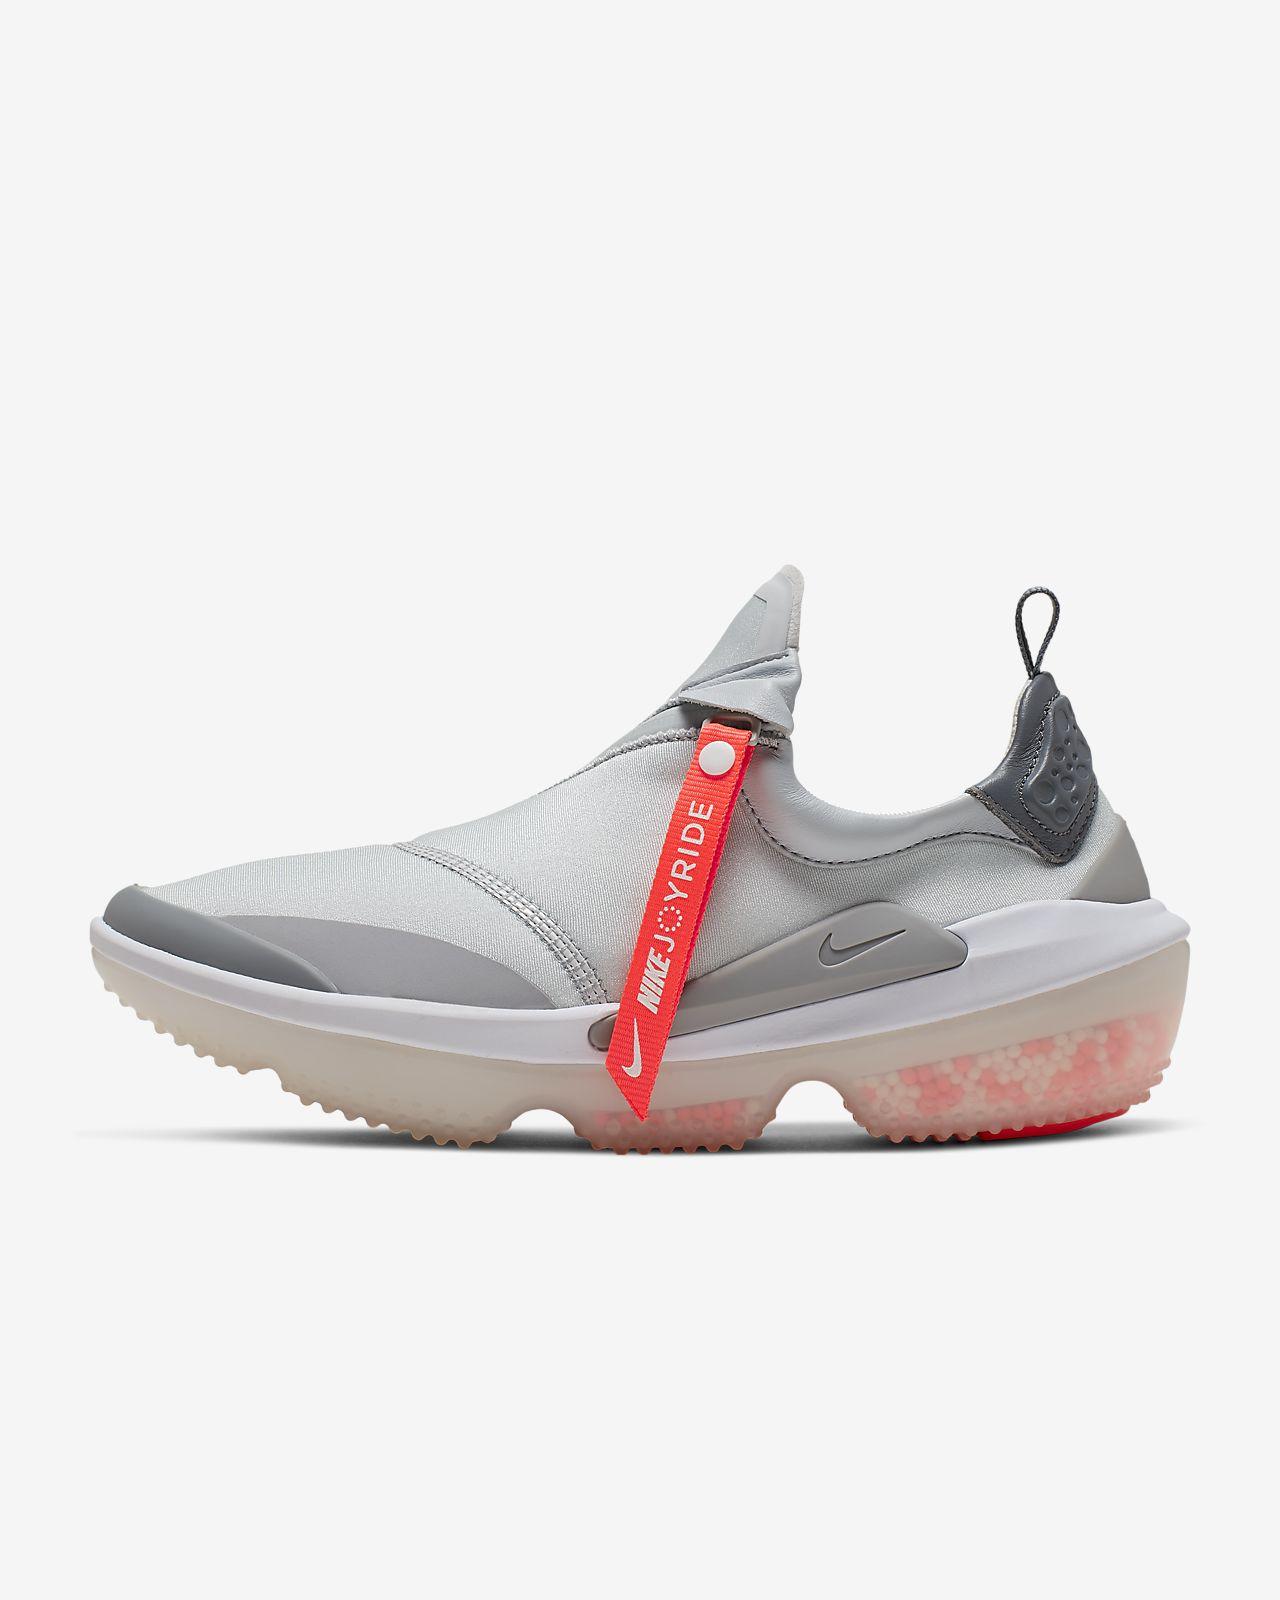 Nike Joyride Optik Damenschuh